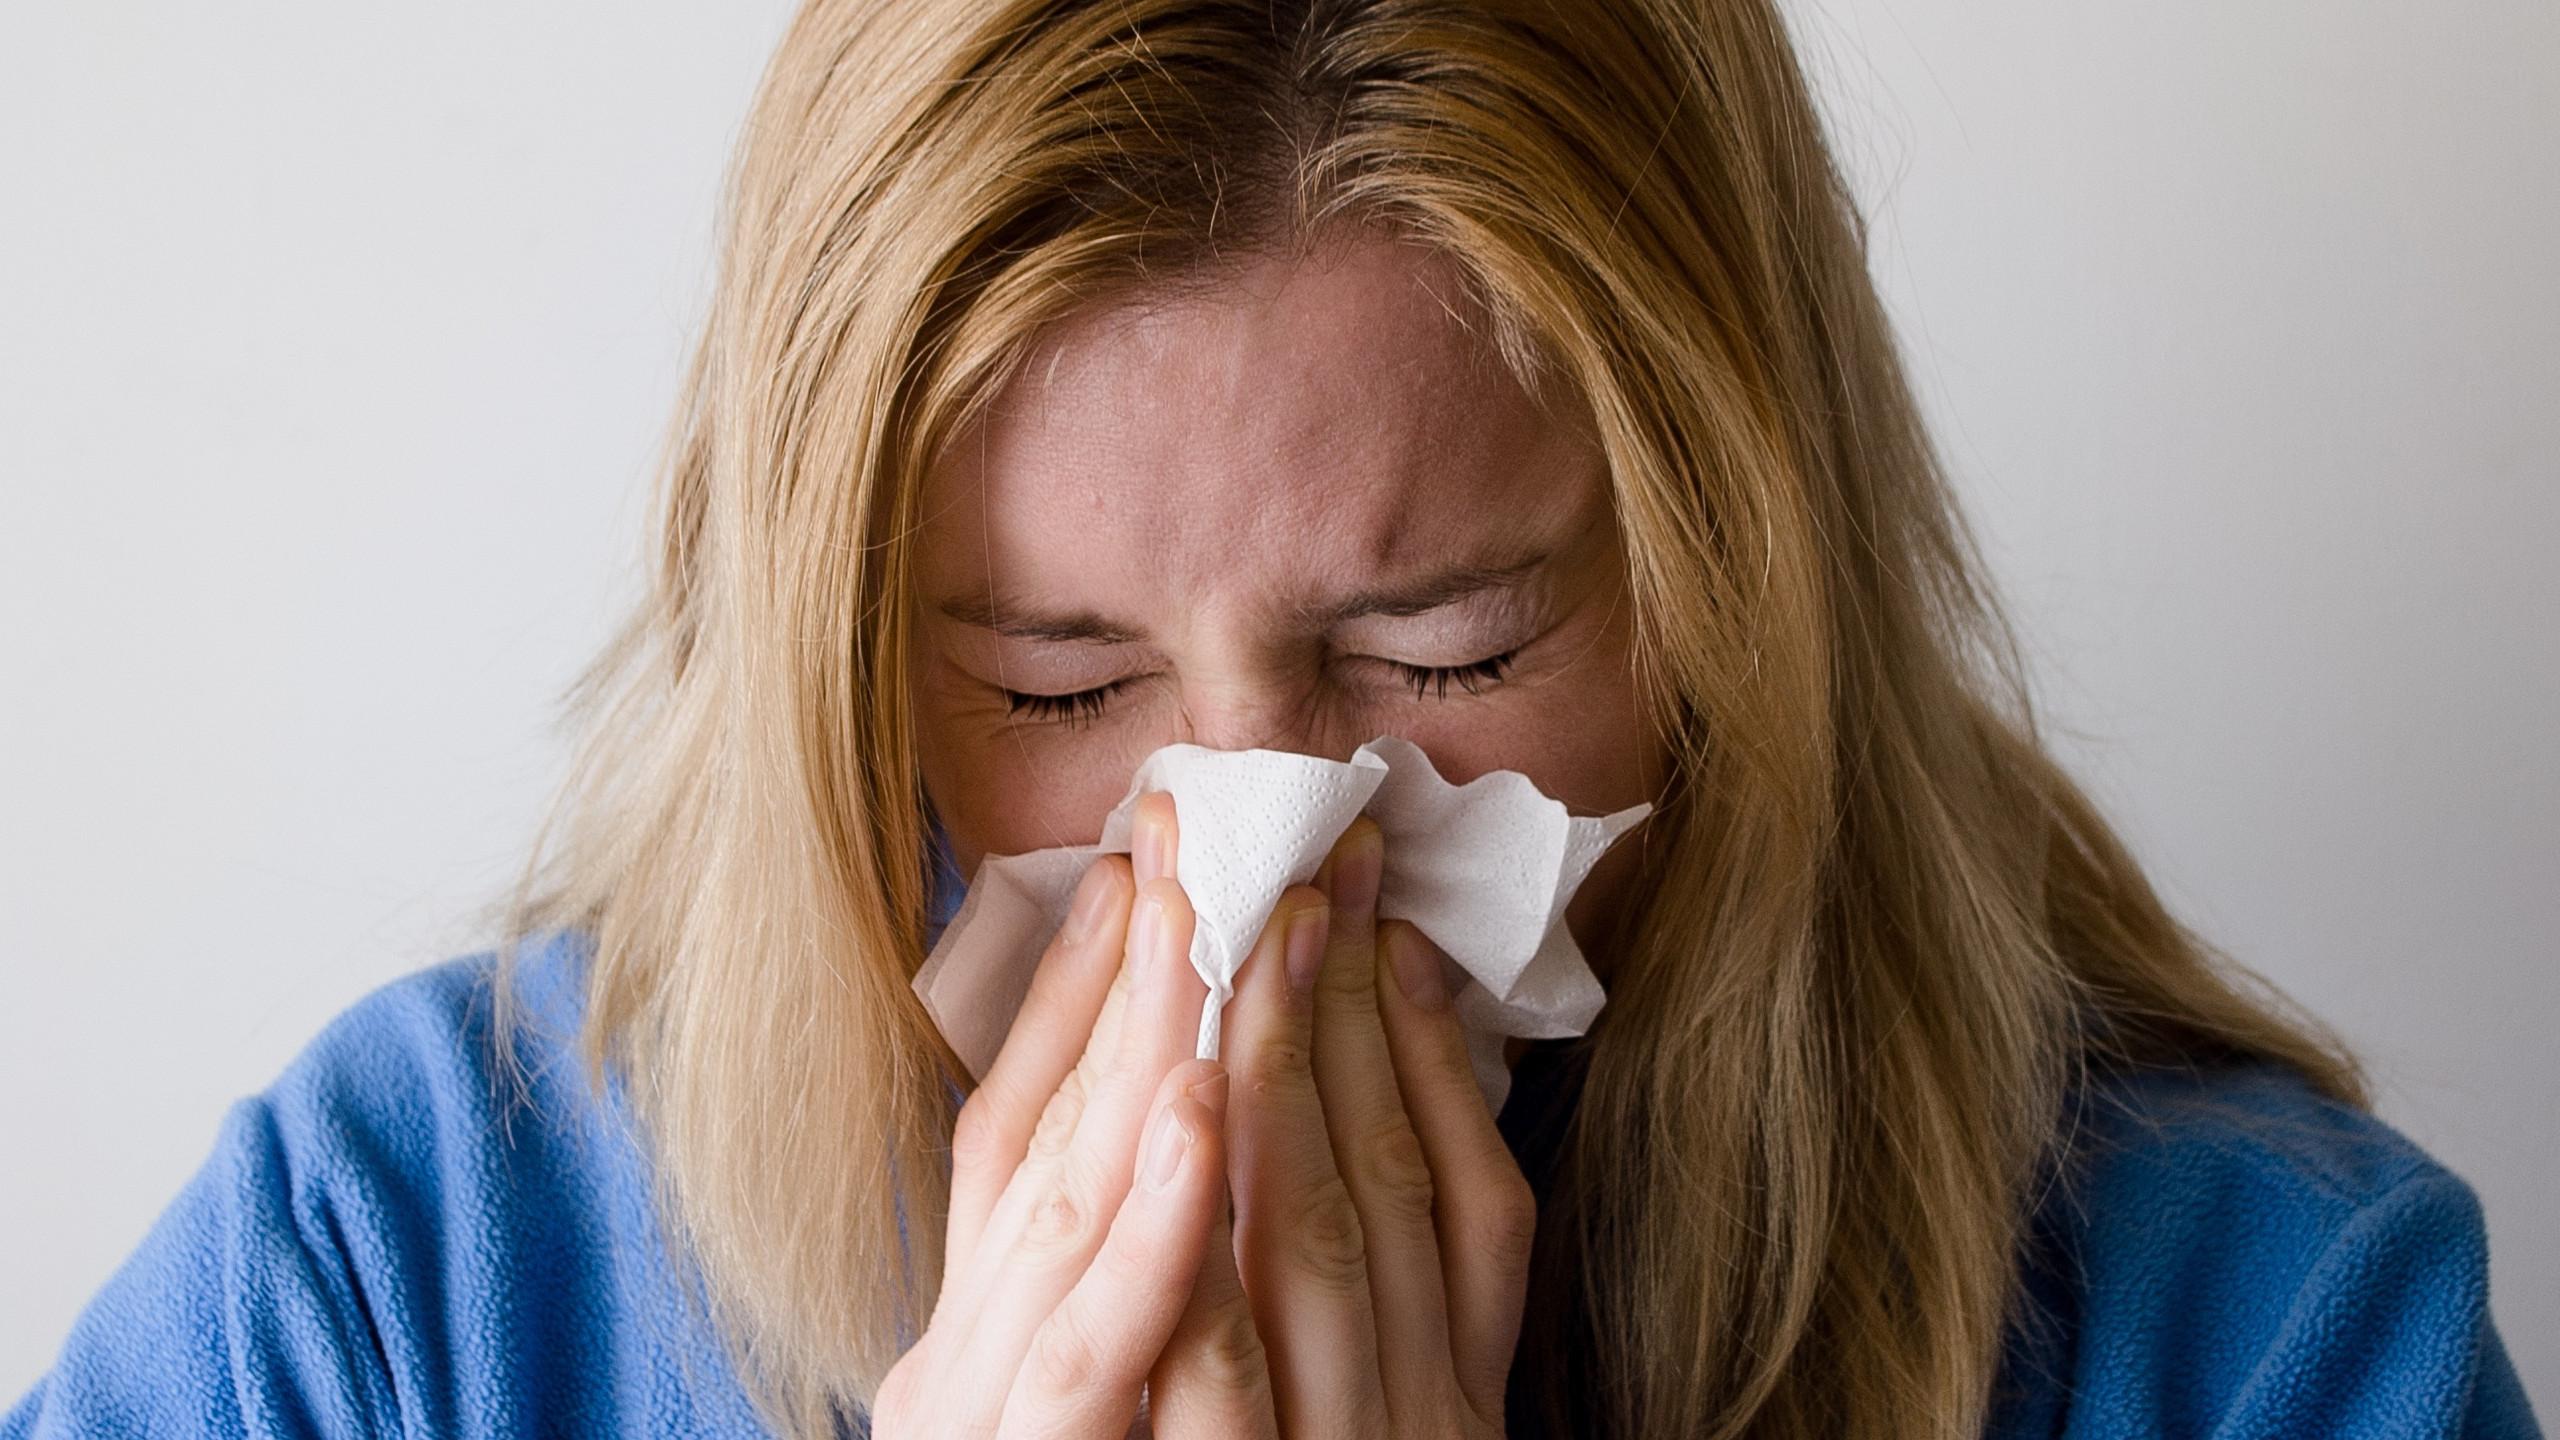 #1 Allergy Relief